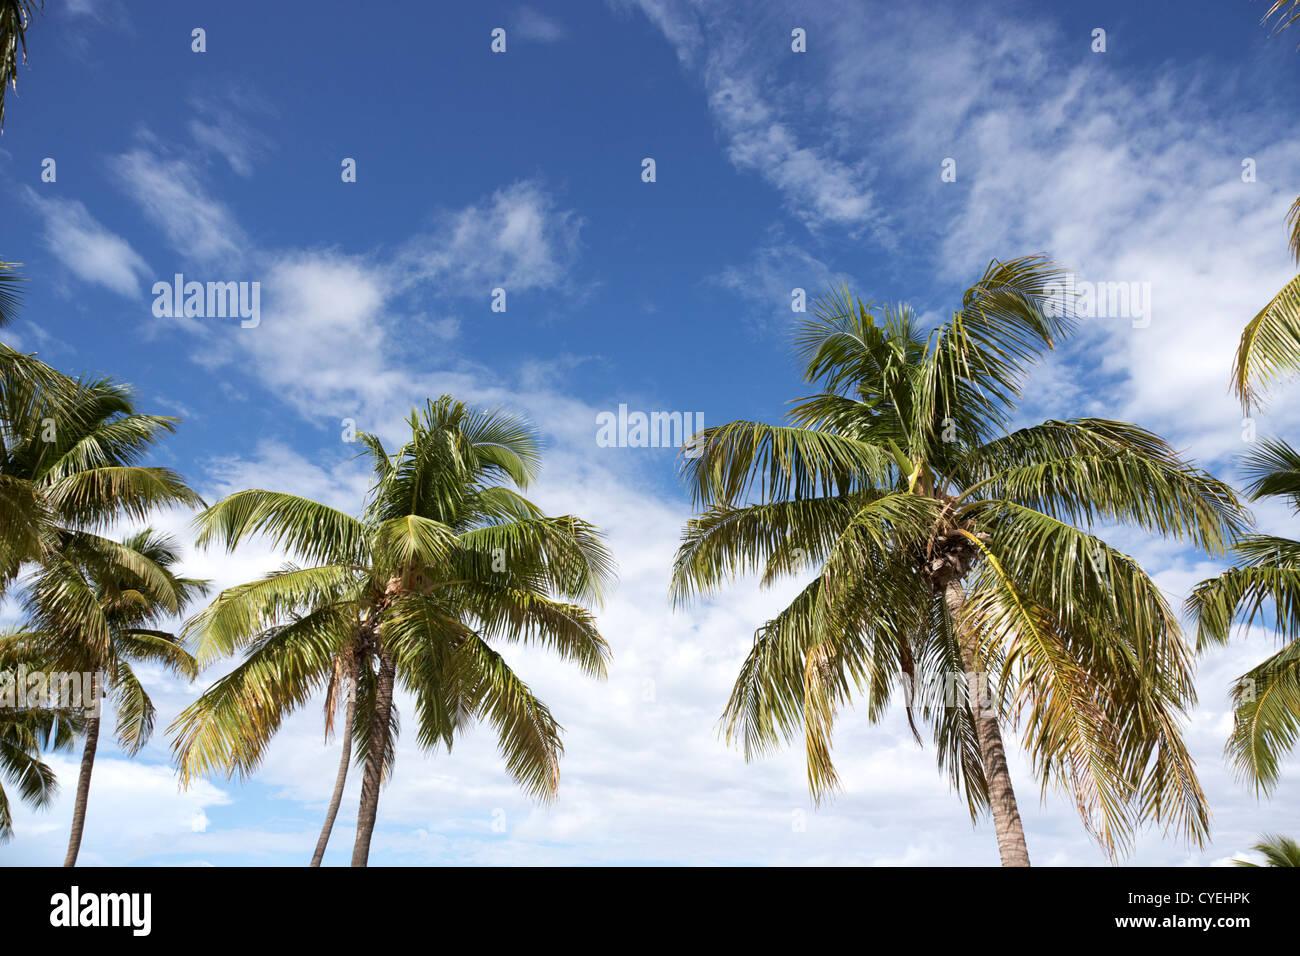 palm trees against blue sky islamorada florida keys usa - Stock Image